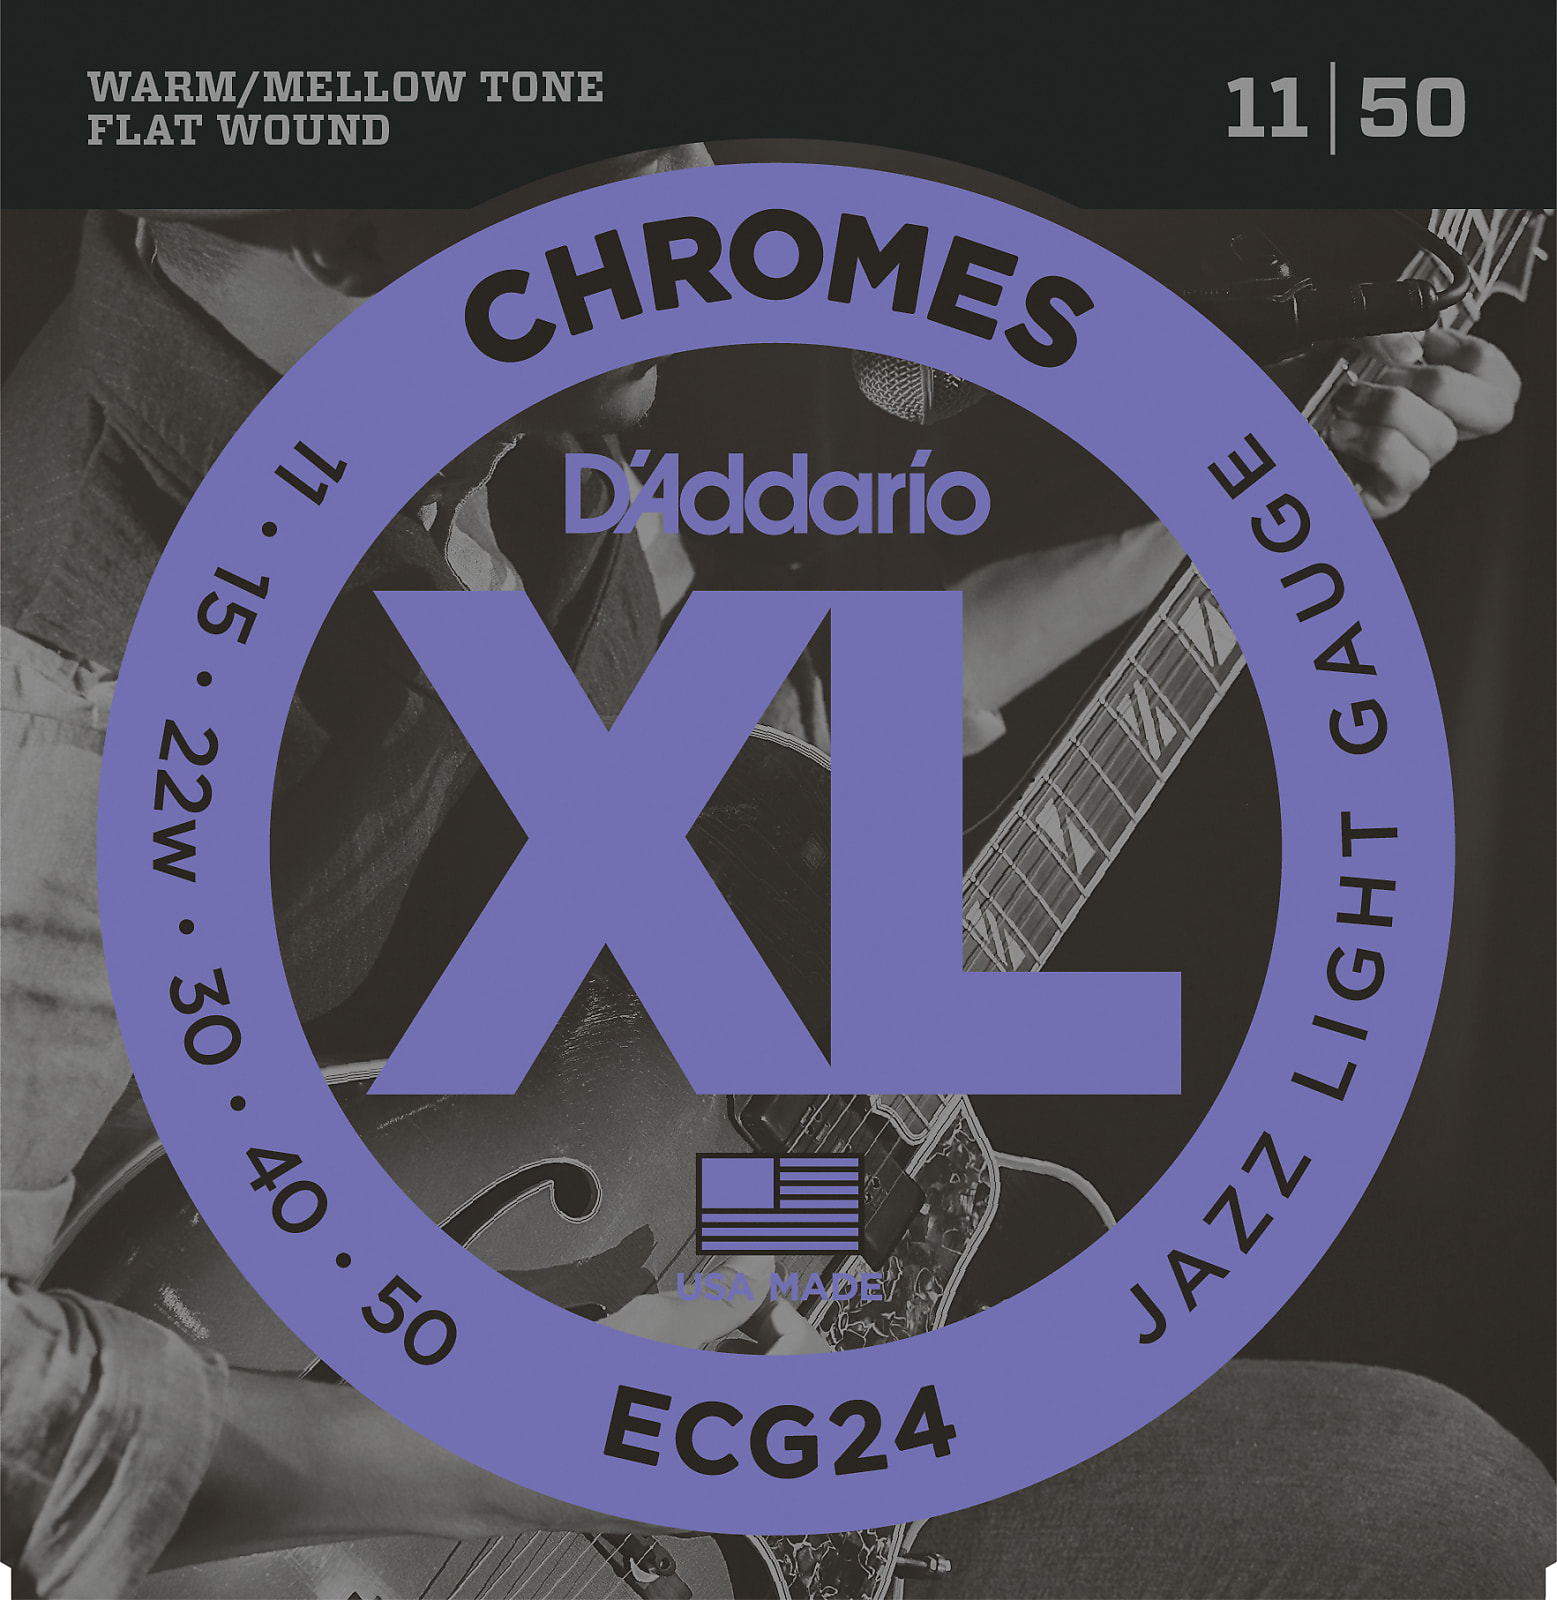 D'Addario ECG24 Chromes Flat Wound Electric Guitar Strings, Jazz Light, 11-50